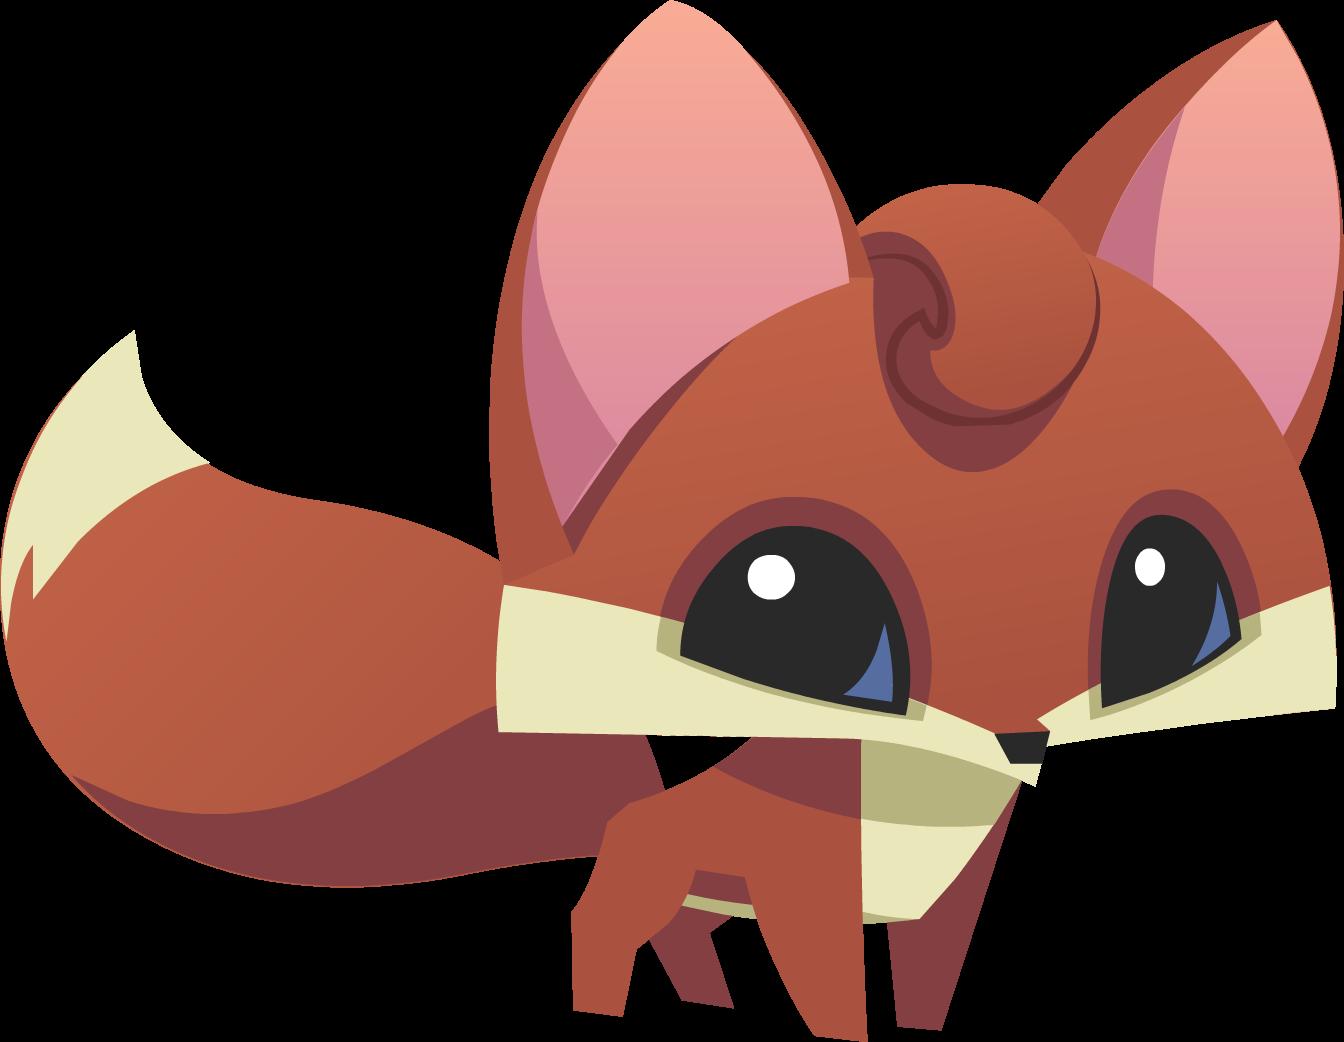 Fox PNG - 18763